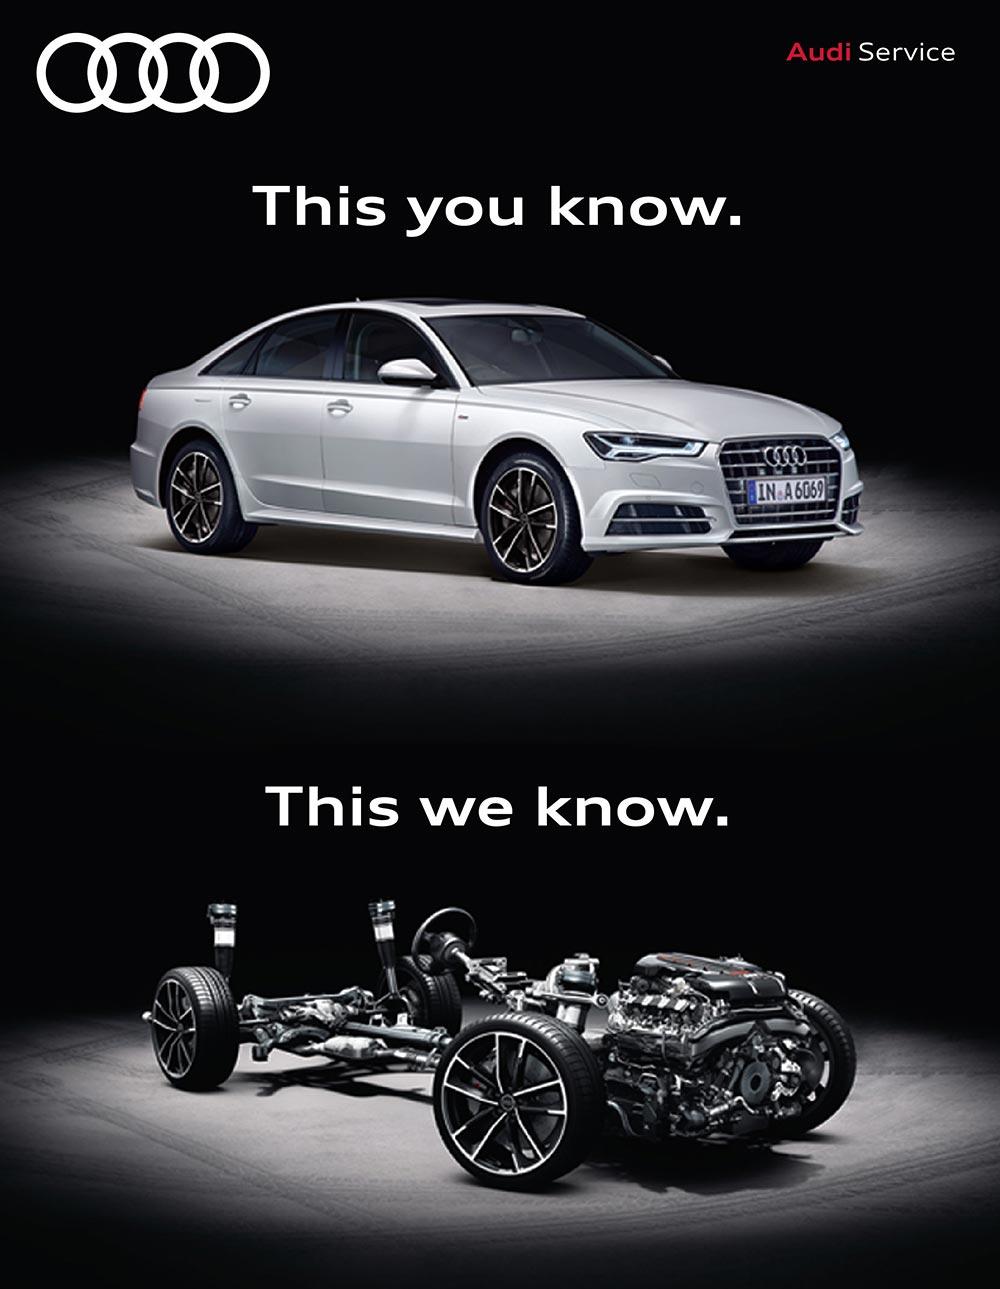 Audi Cars in India